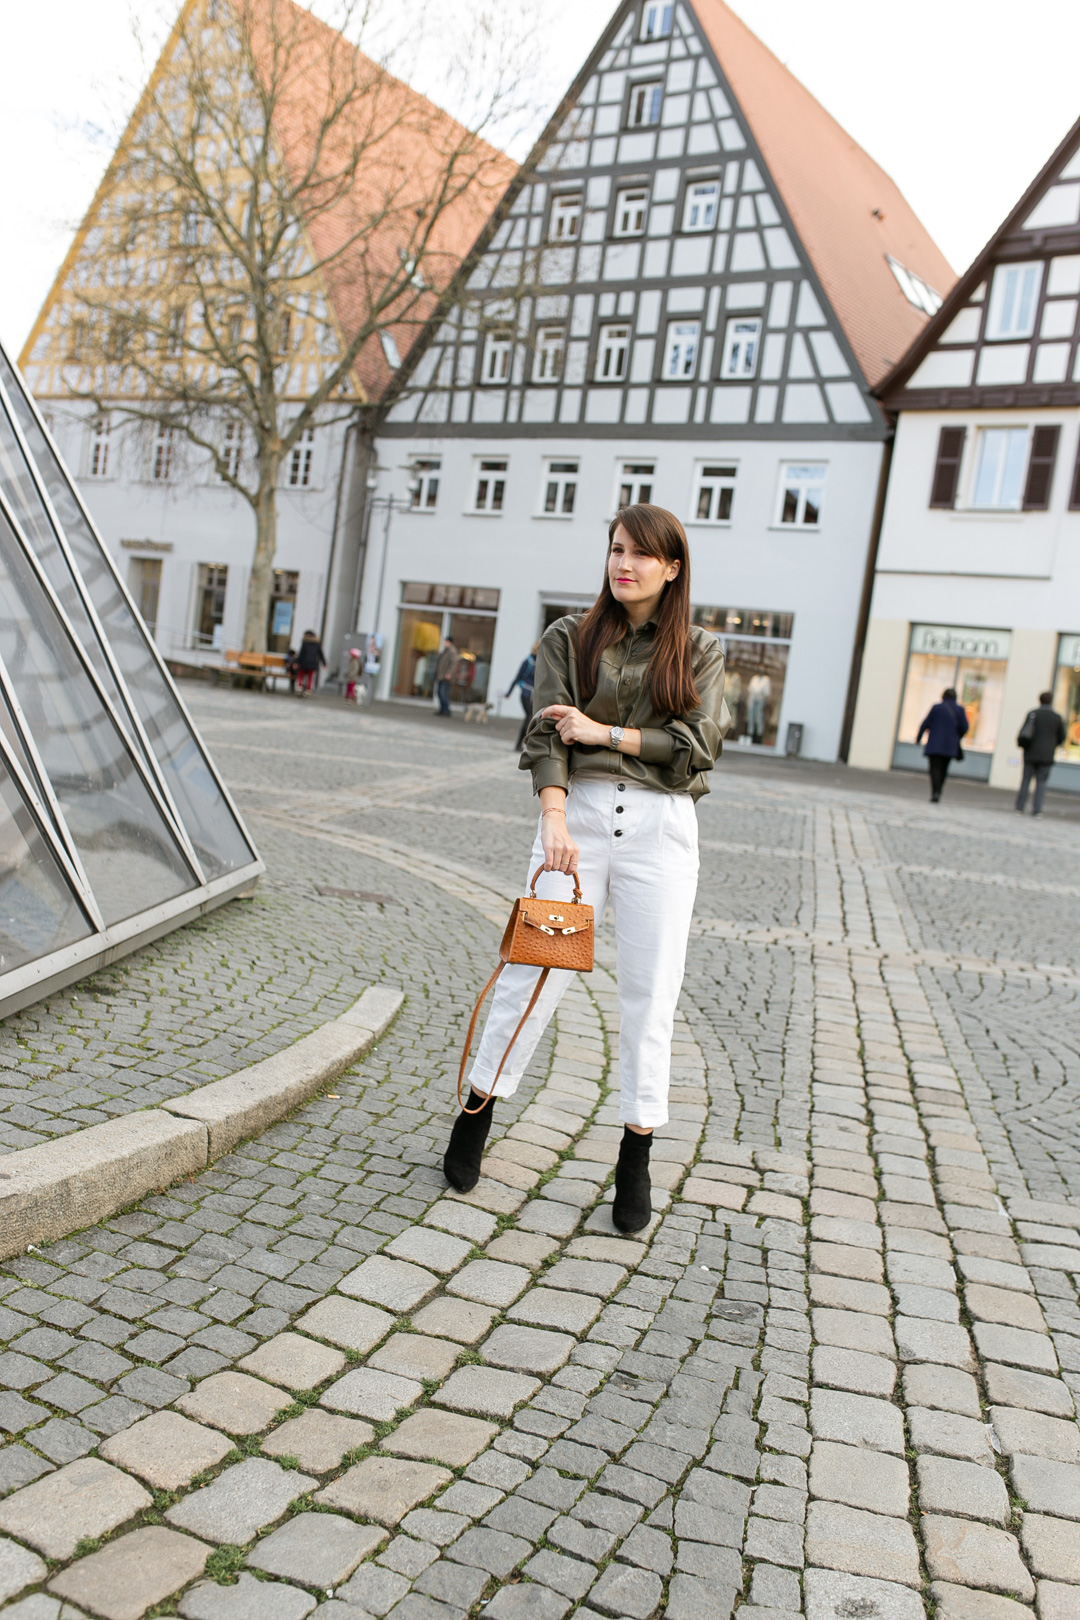 Lederbluse stylen - Pieces of Mariposa / Fashion & Lifestyle Blog aus Nürnberg